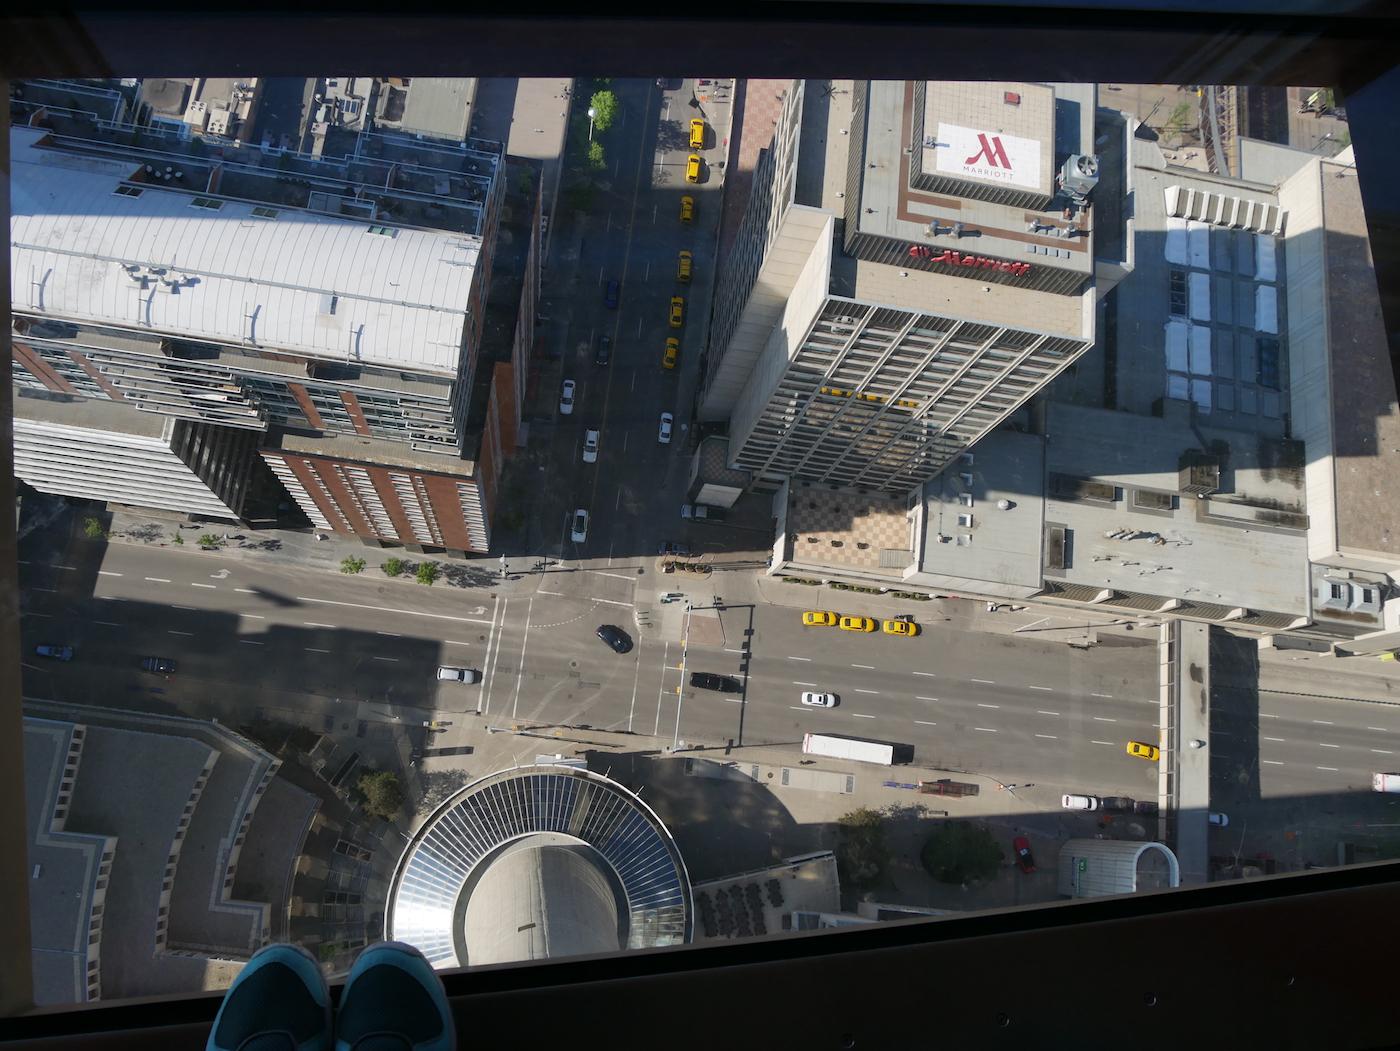 Calgary Tower dans le vide